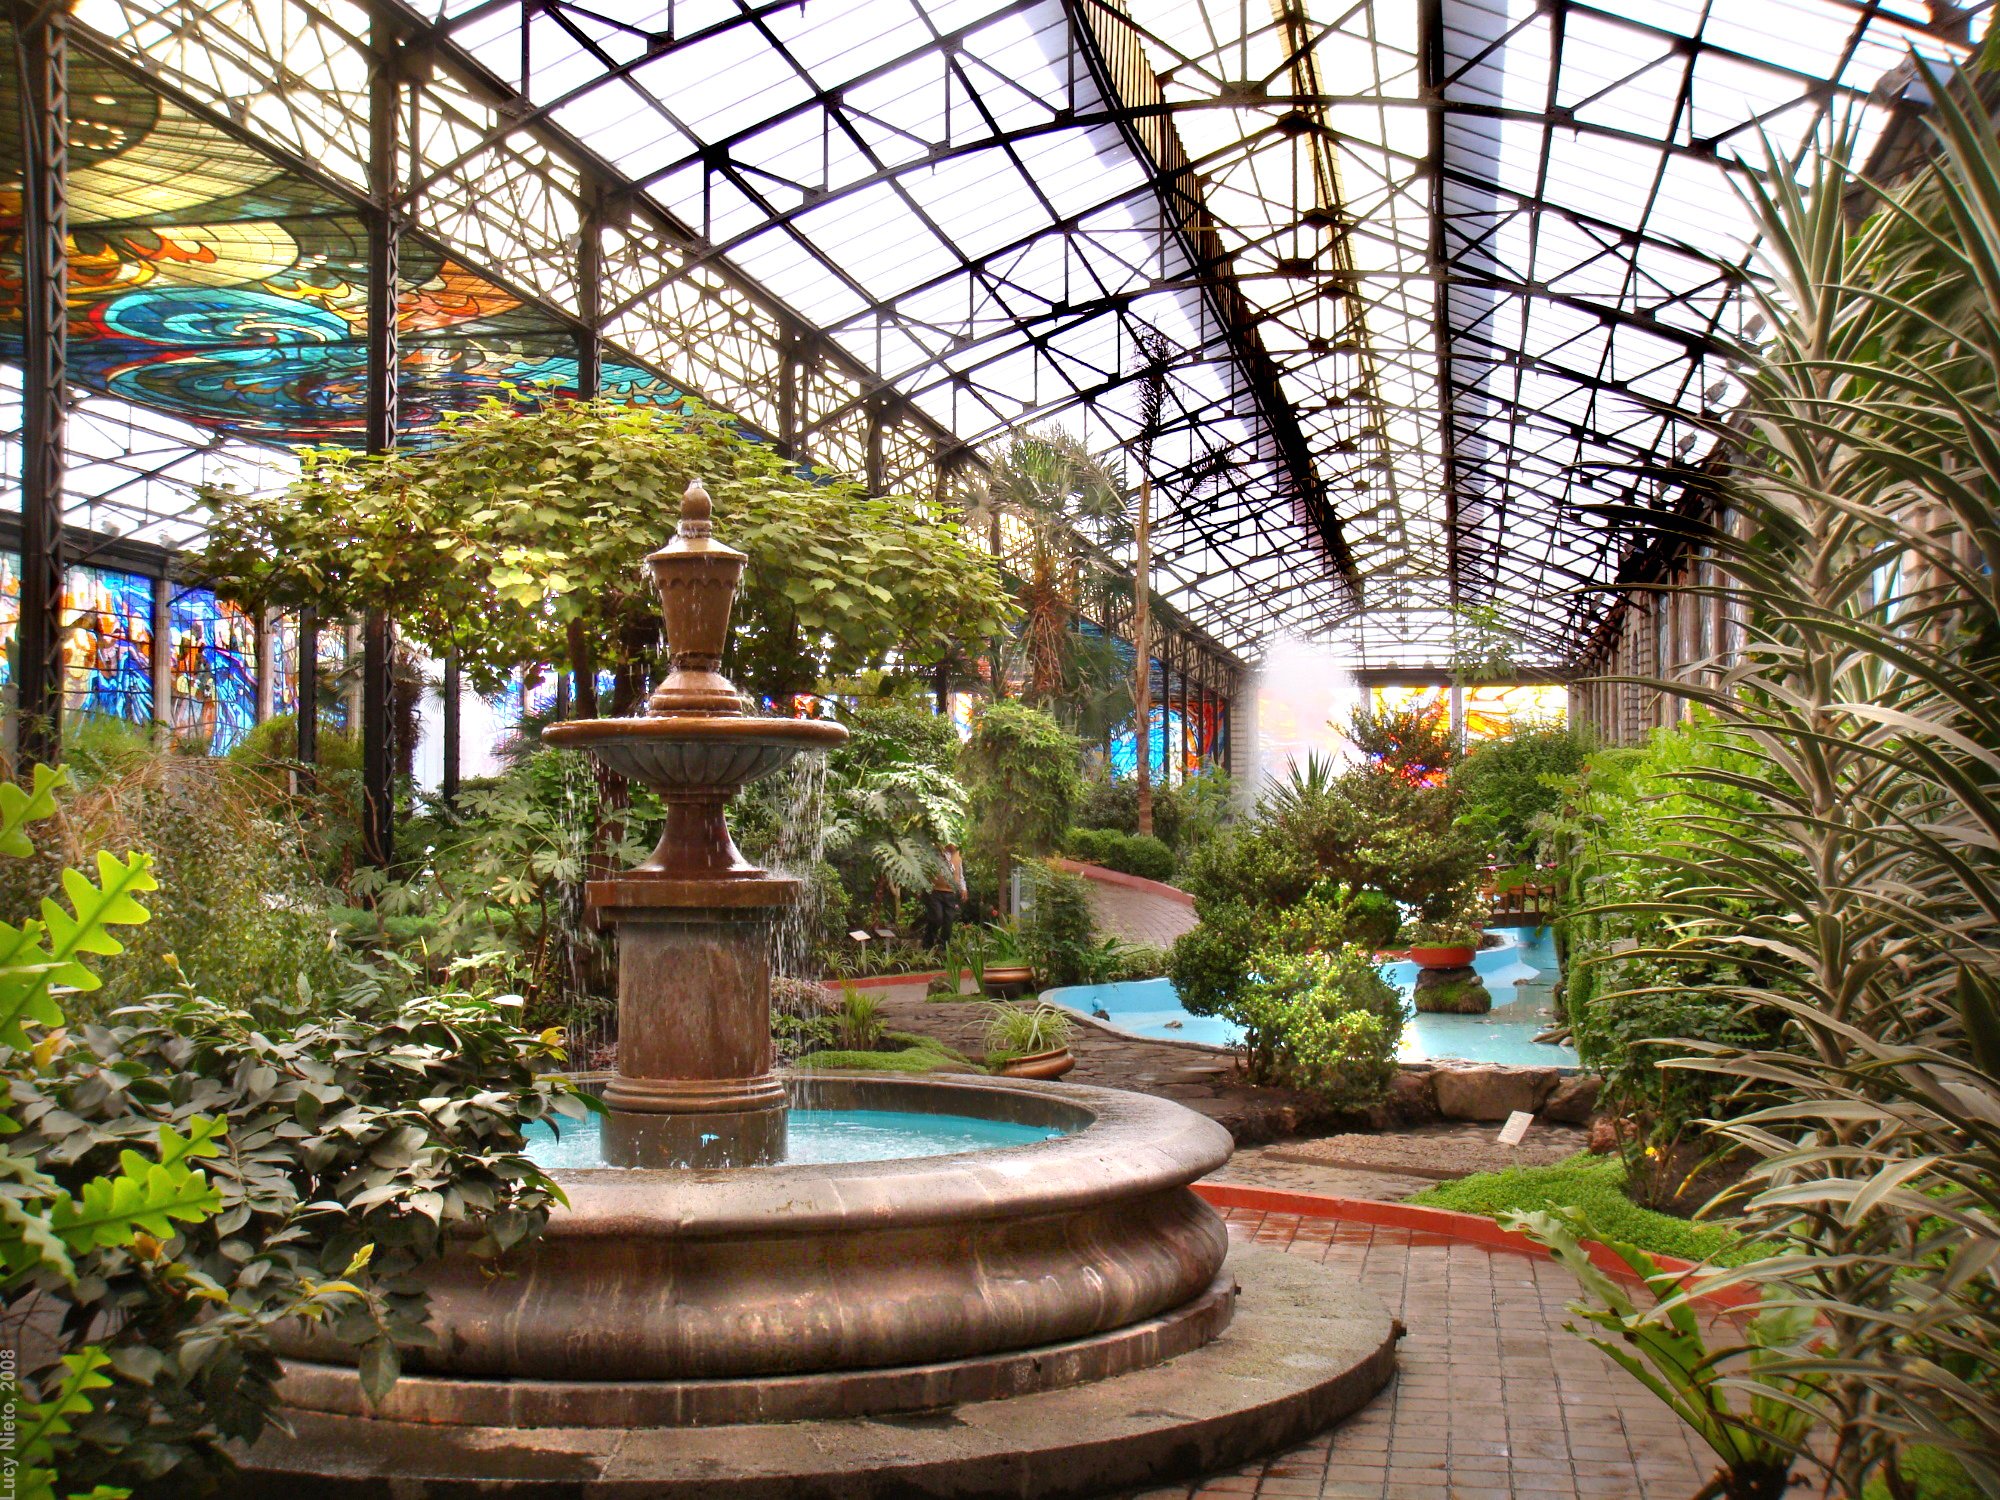 Cosmovitral jard n bot nico vista geneal toluca m xi for Botanico jardin